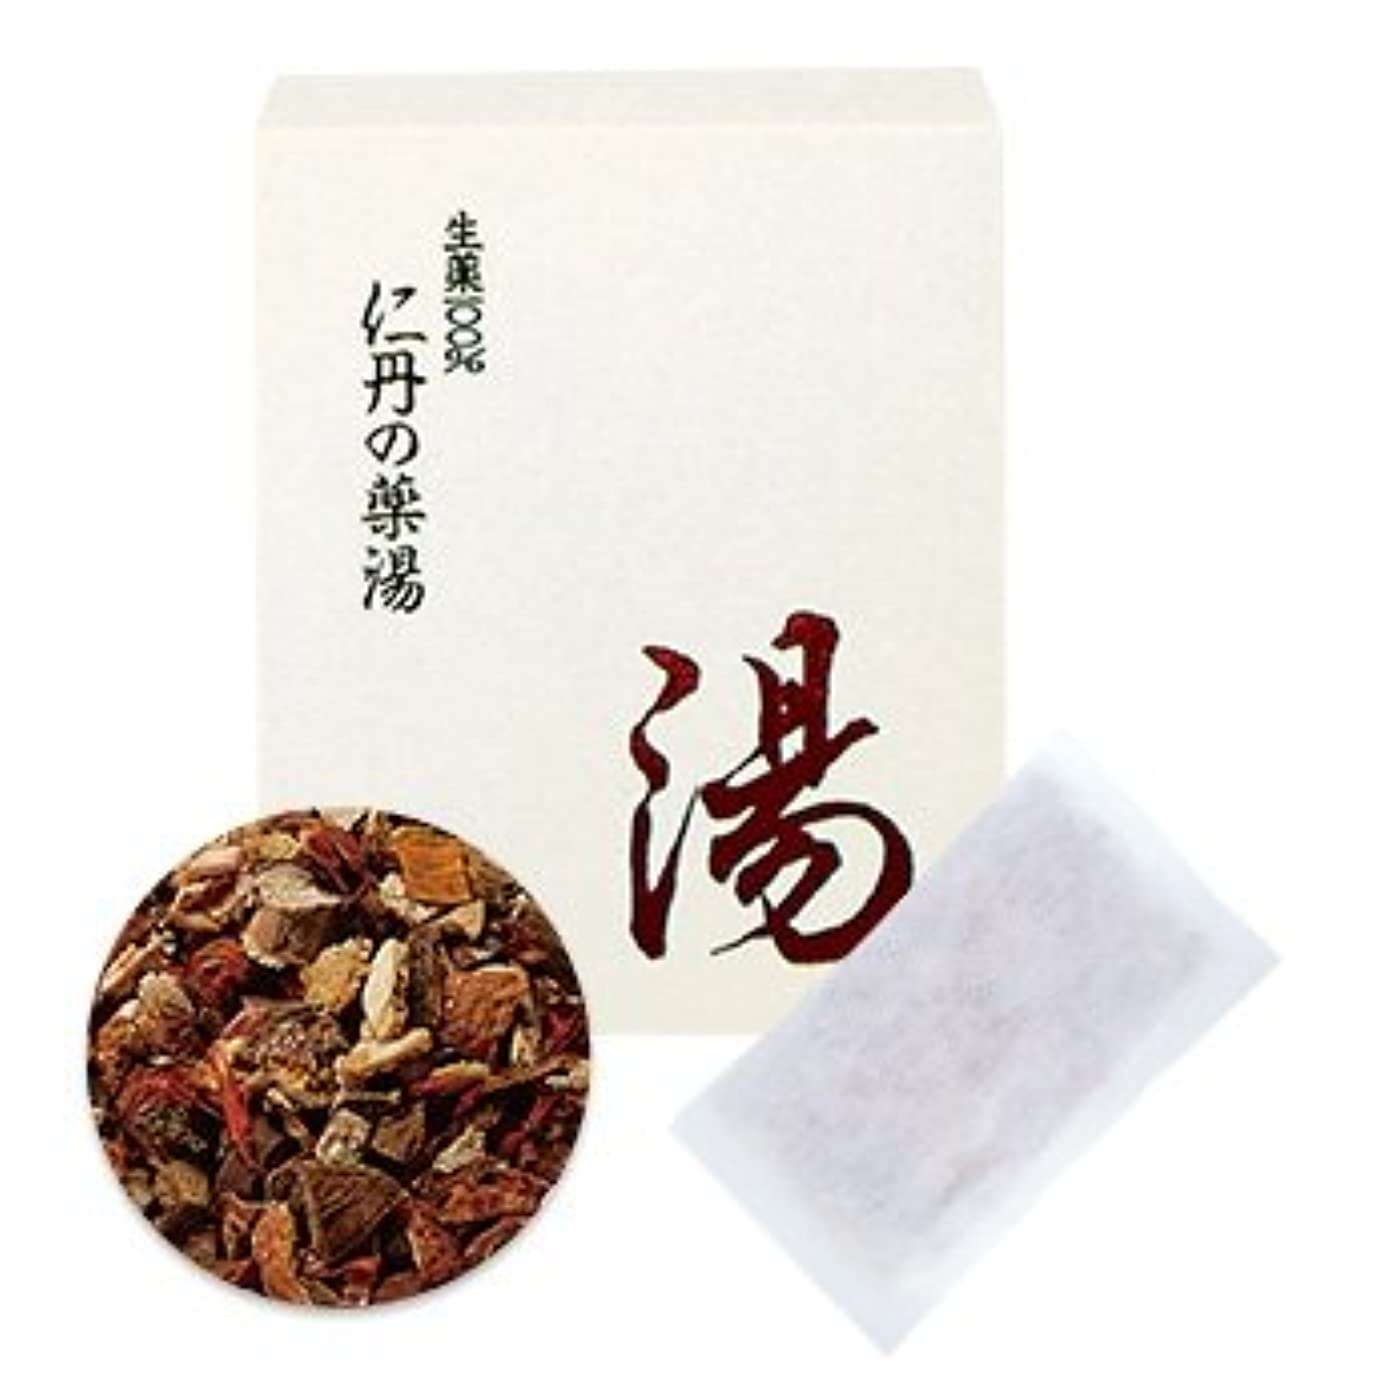 不誠実メーカー許可森下仁丹 仁丹の薬湯(ハード) 10包 医薬部外品